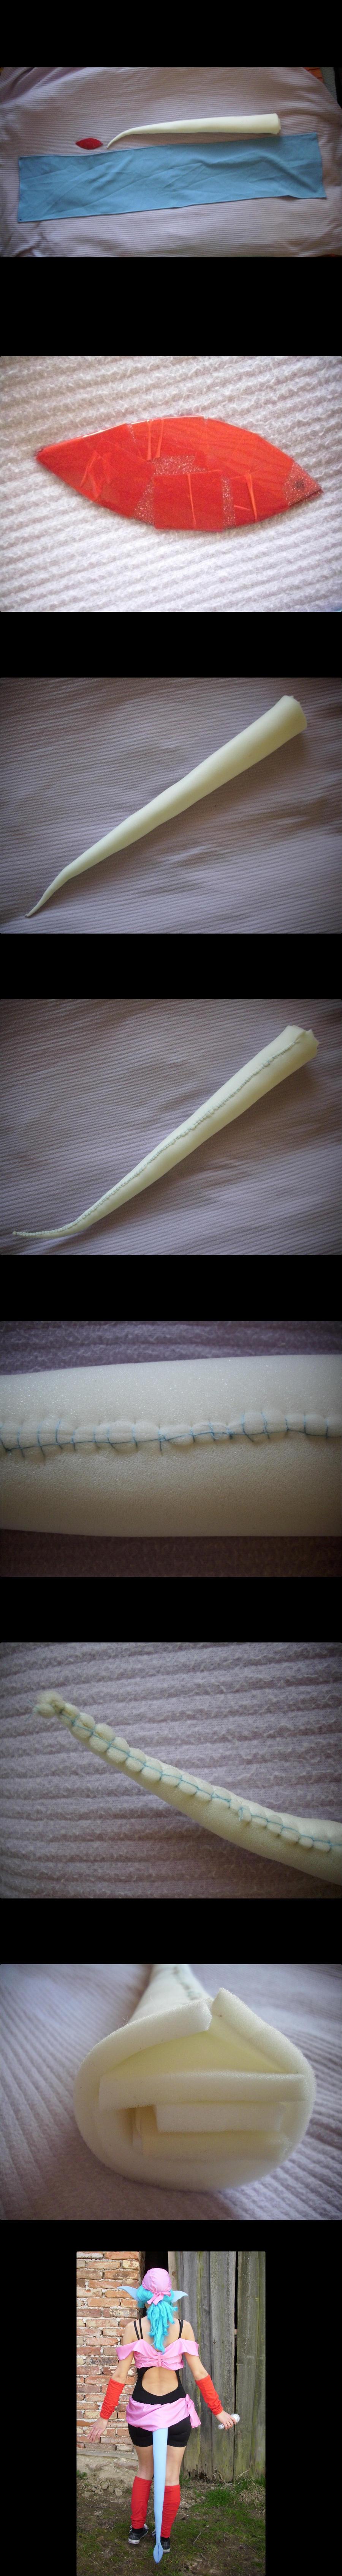 Juri - Yu Yu Hakusho - cosplay - tail by Esarina